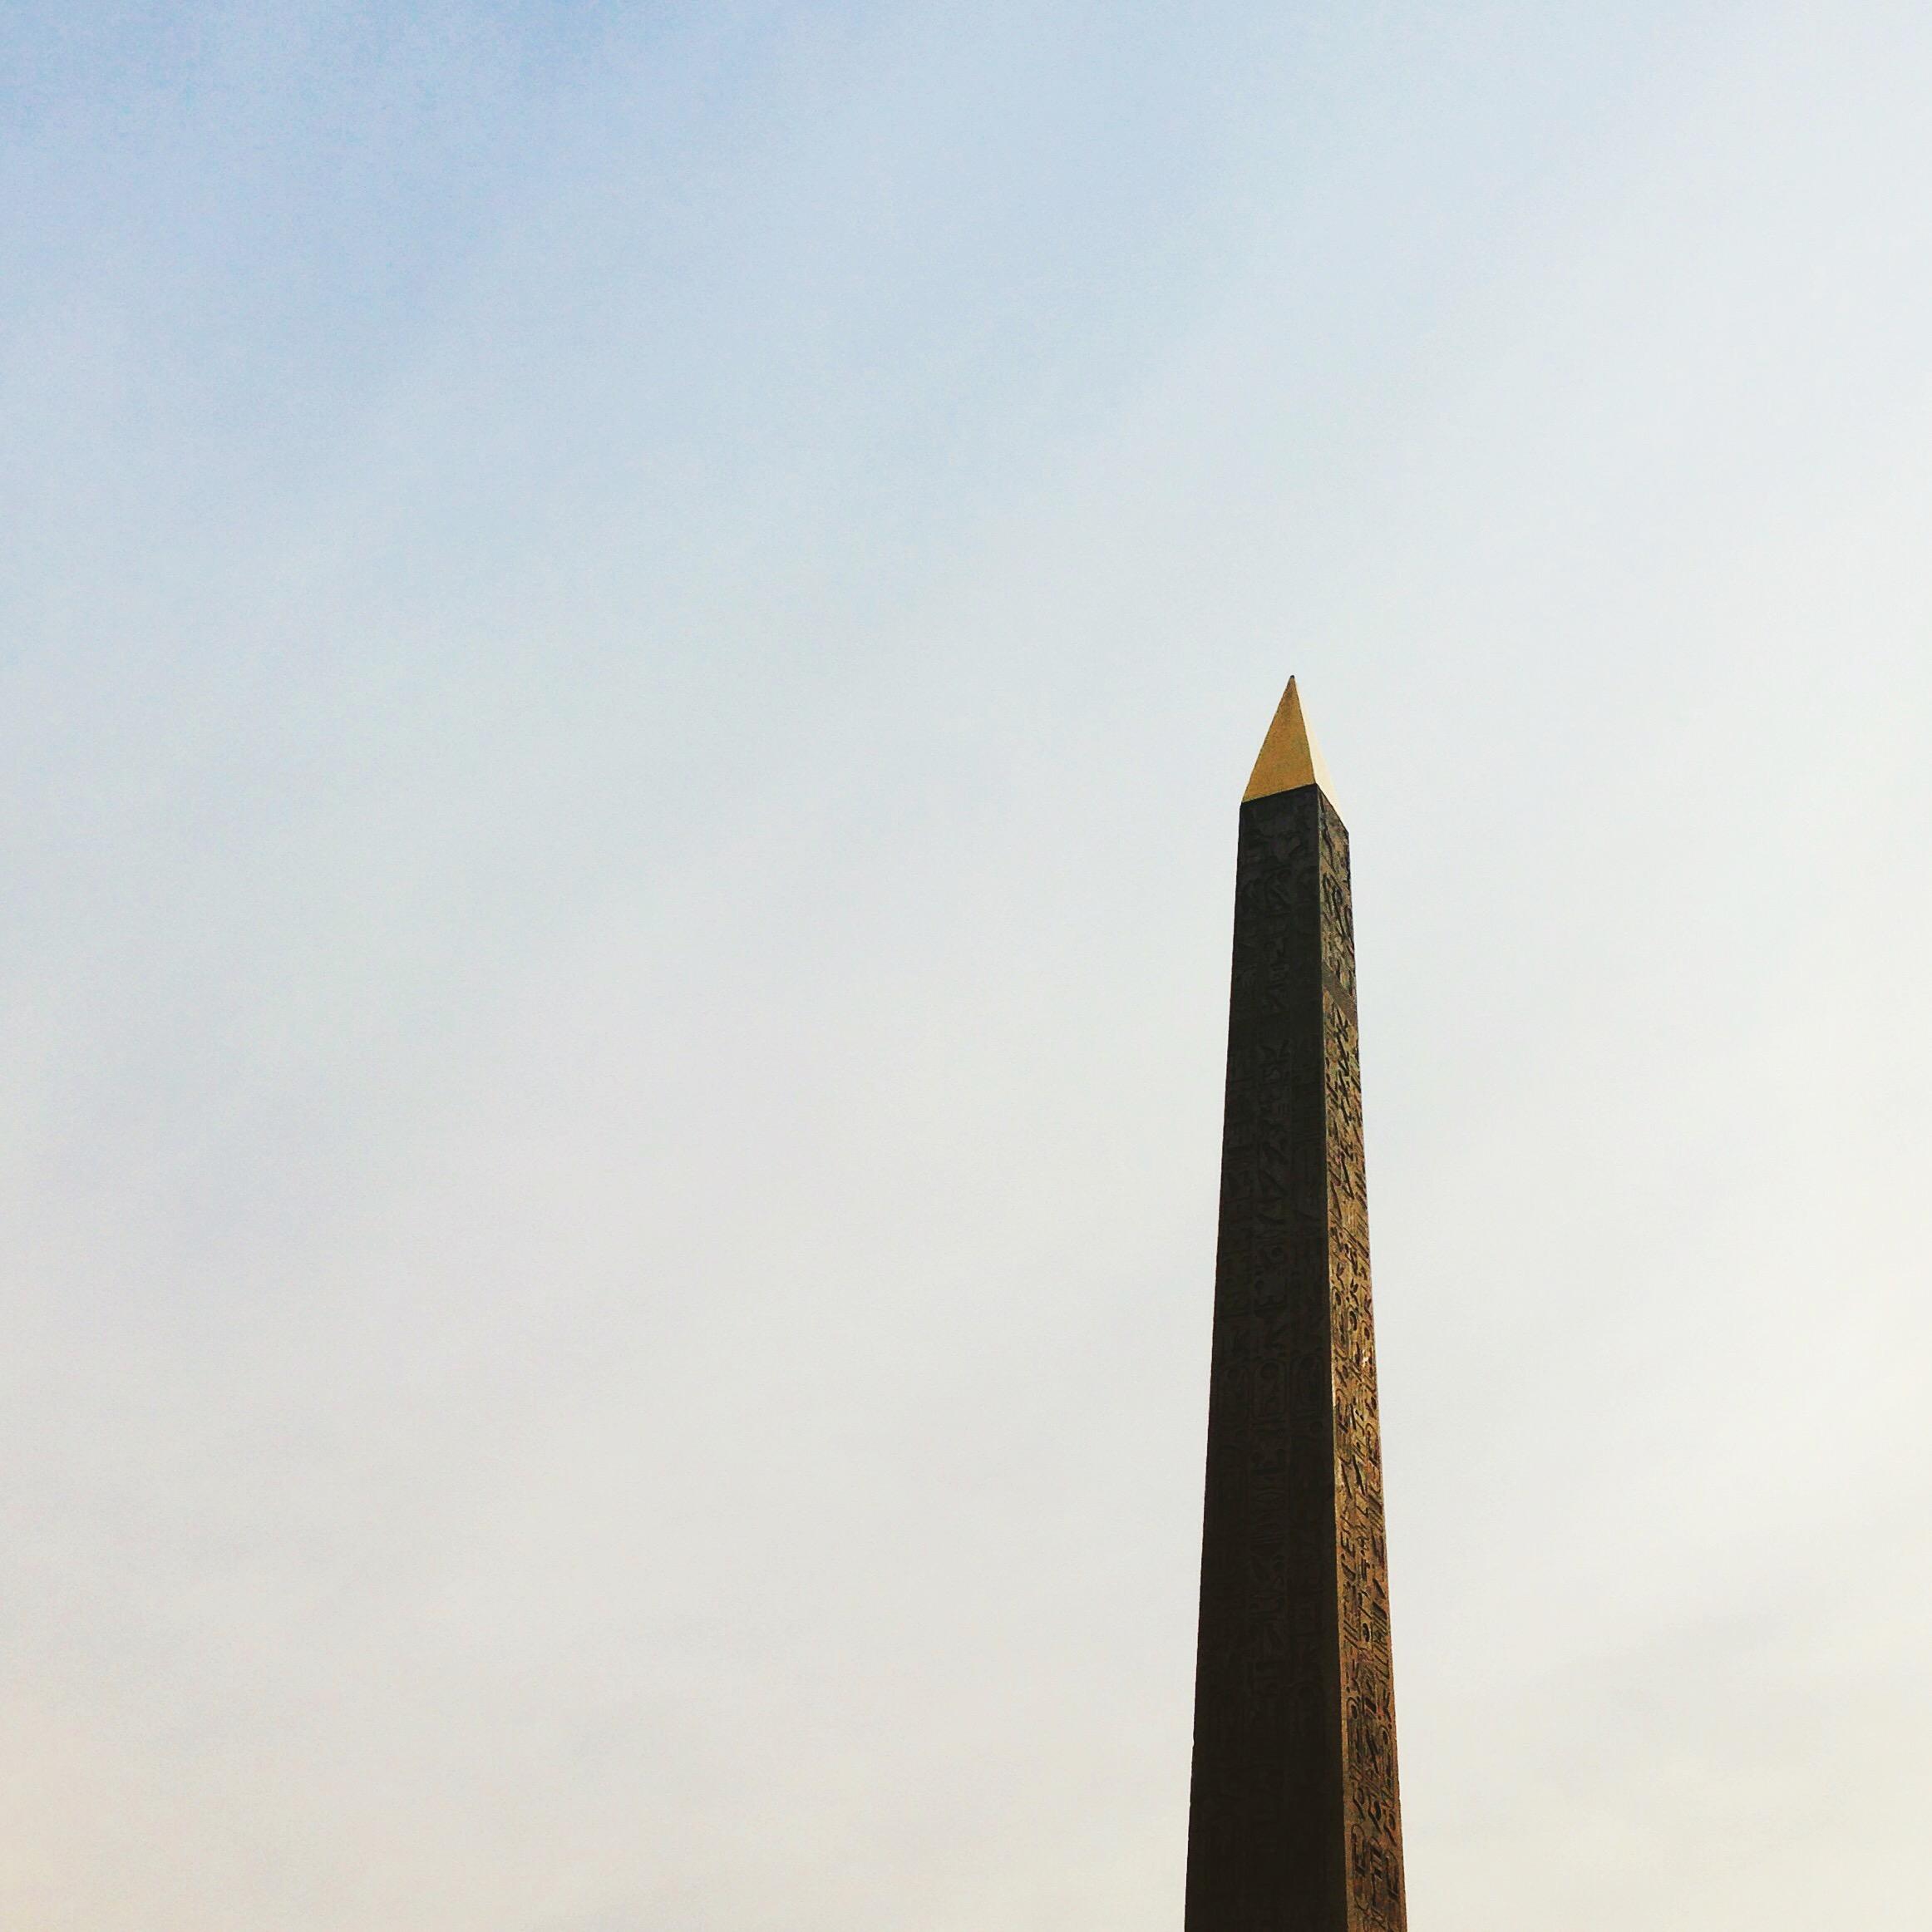 Lozidaze_Paris-Obelisk_01